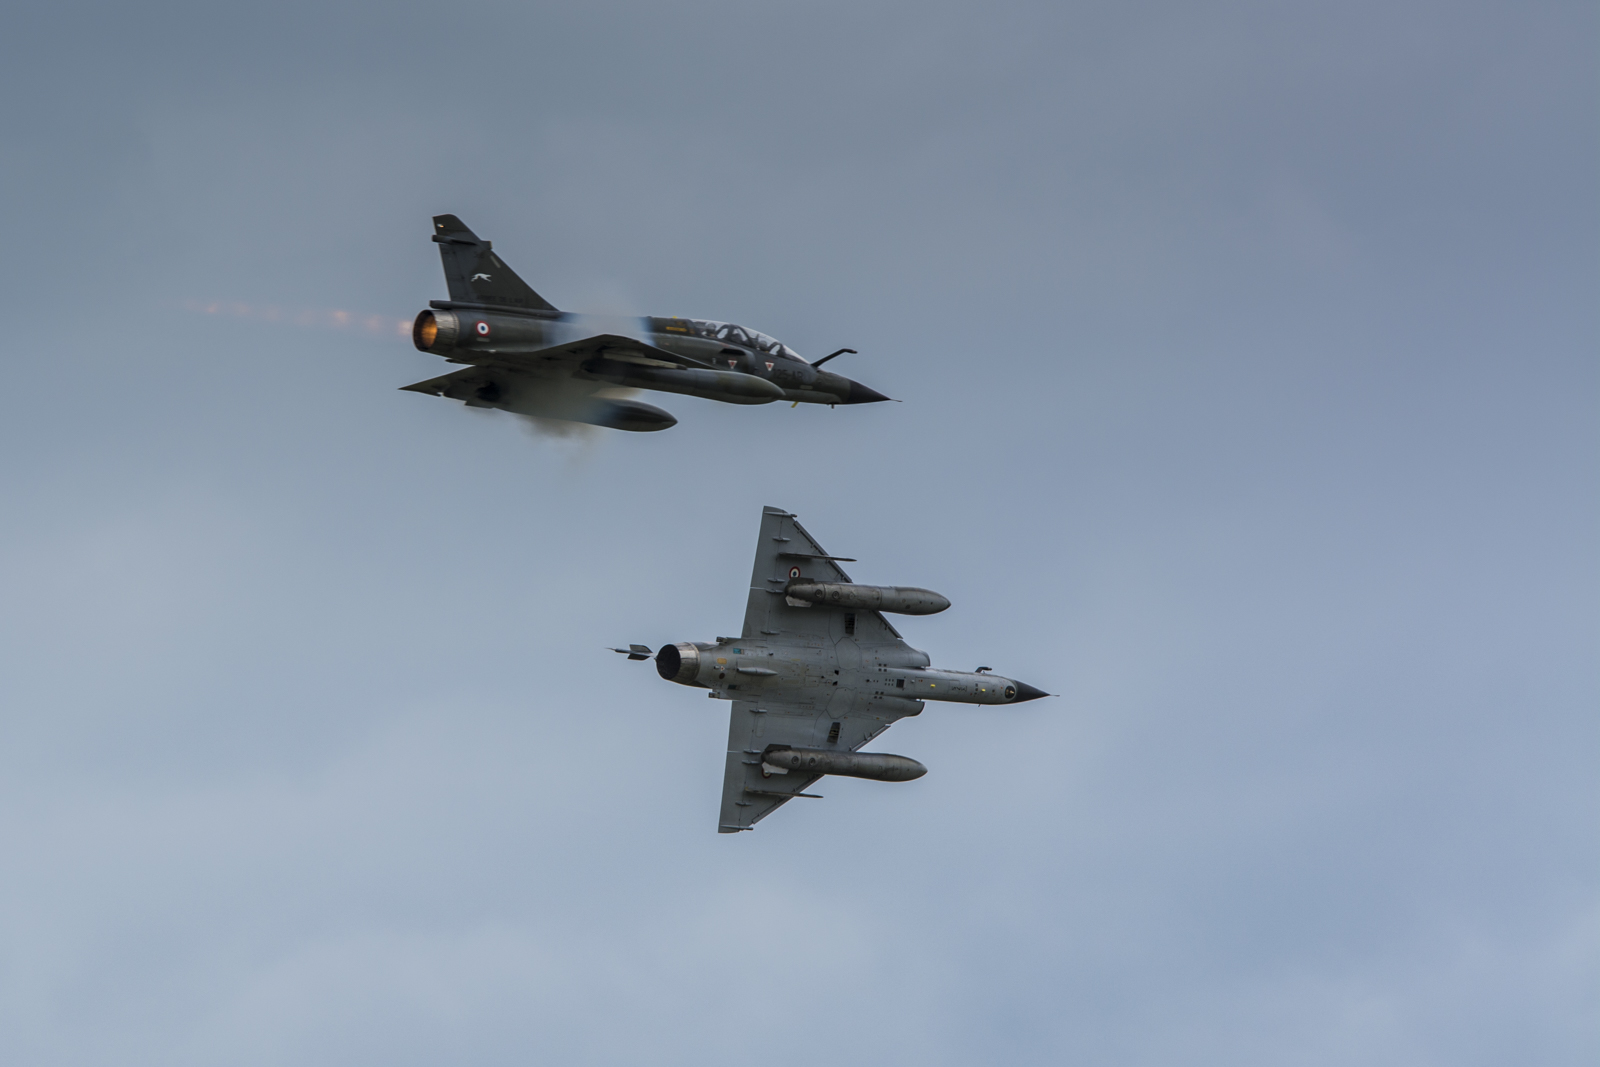 AIR14: Le team Ramex Delta sur Mirage 2000.